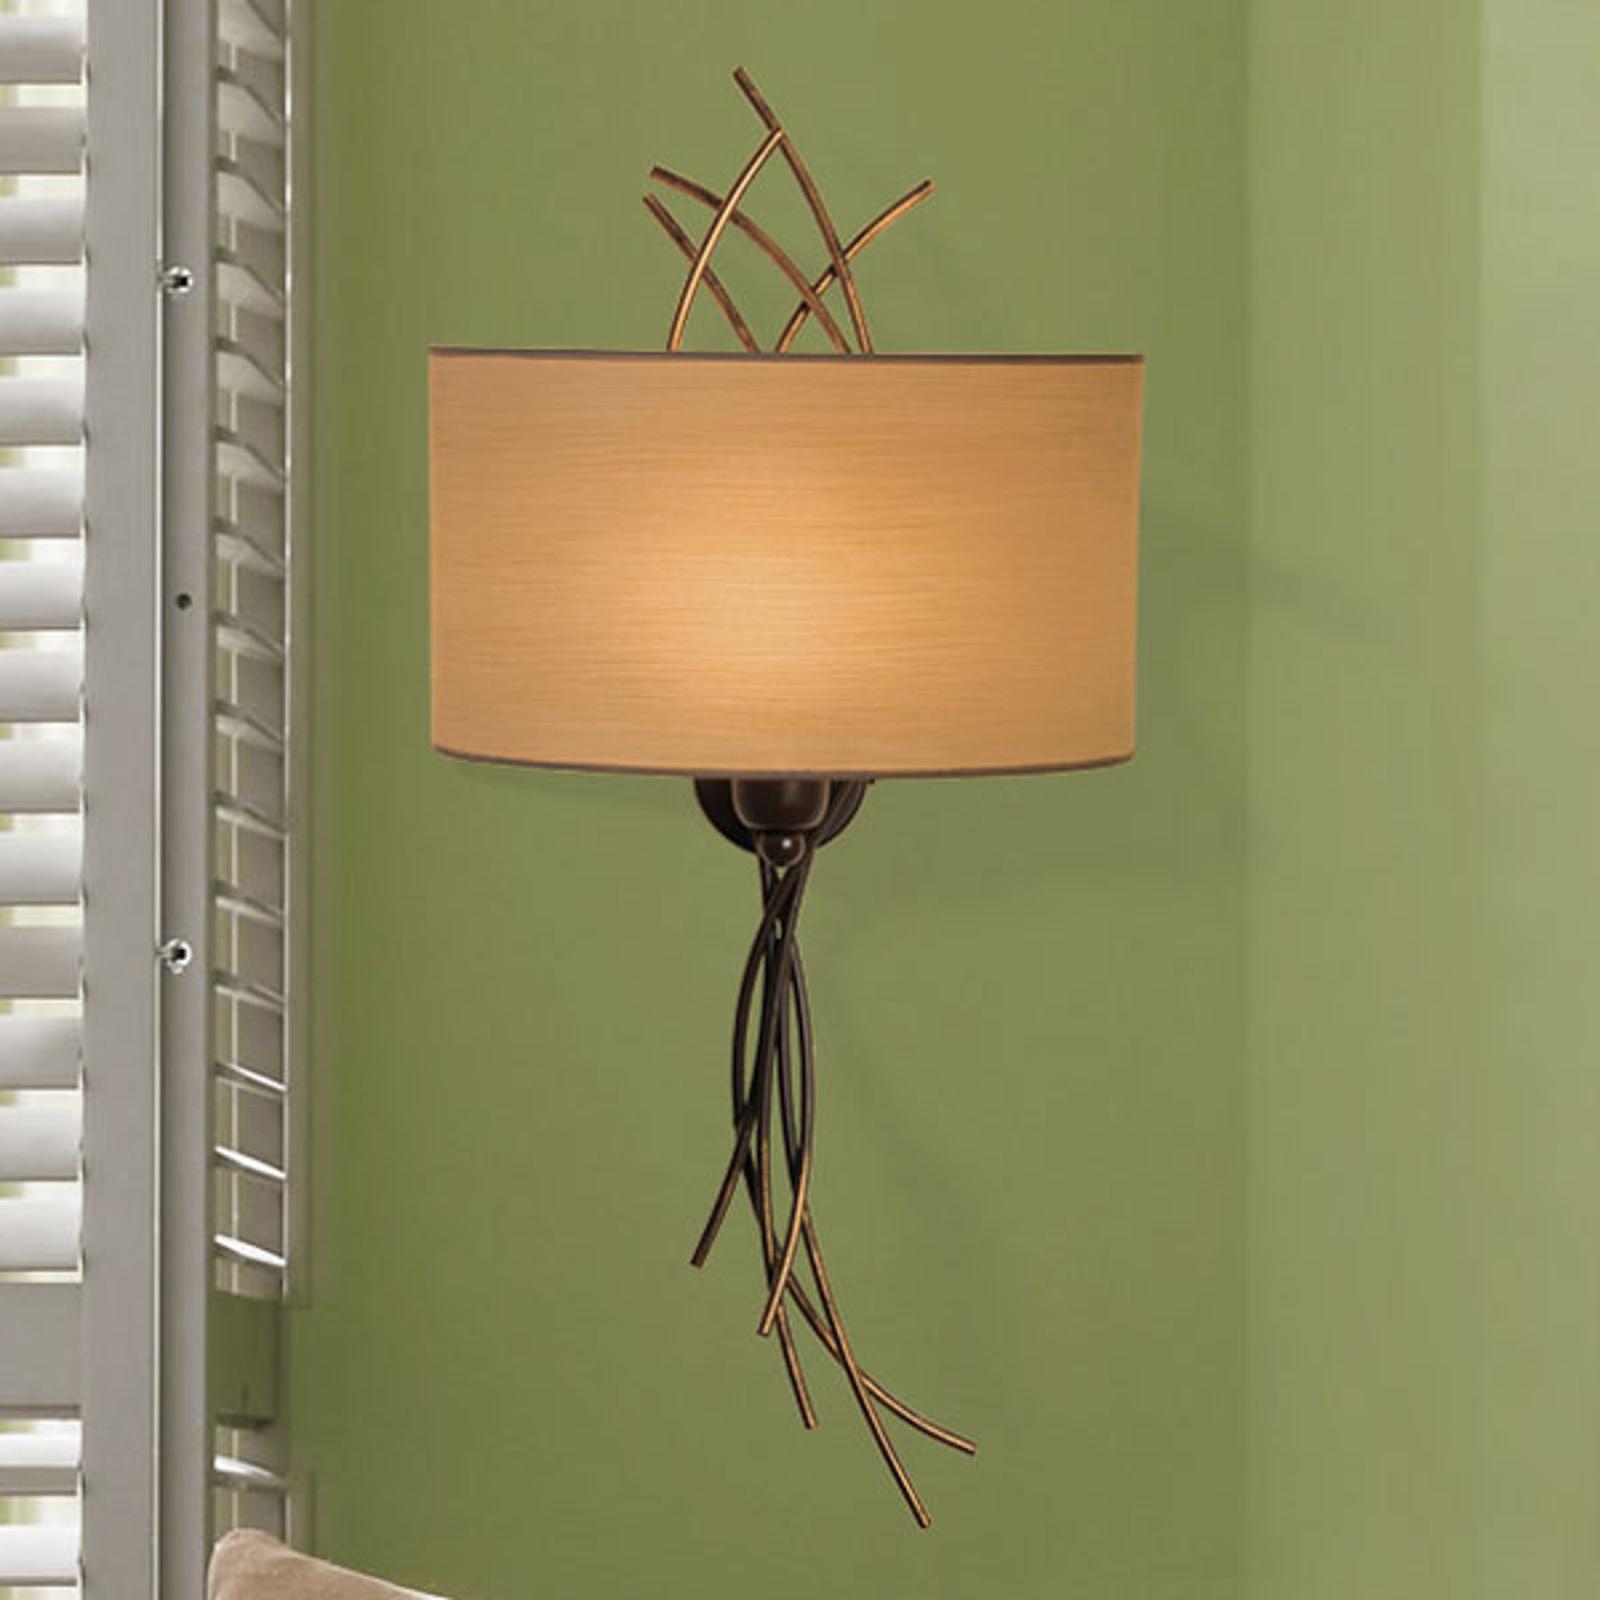 LIVING OVAL - dekoracyjna lampa ścienna